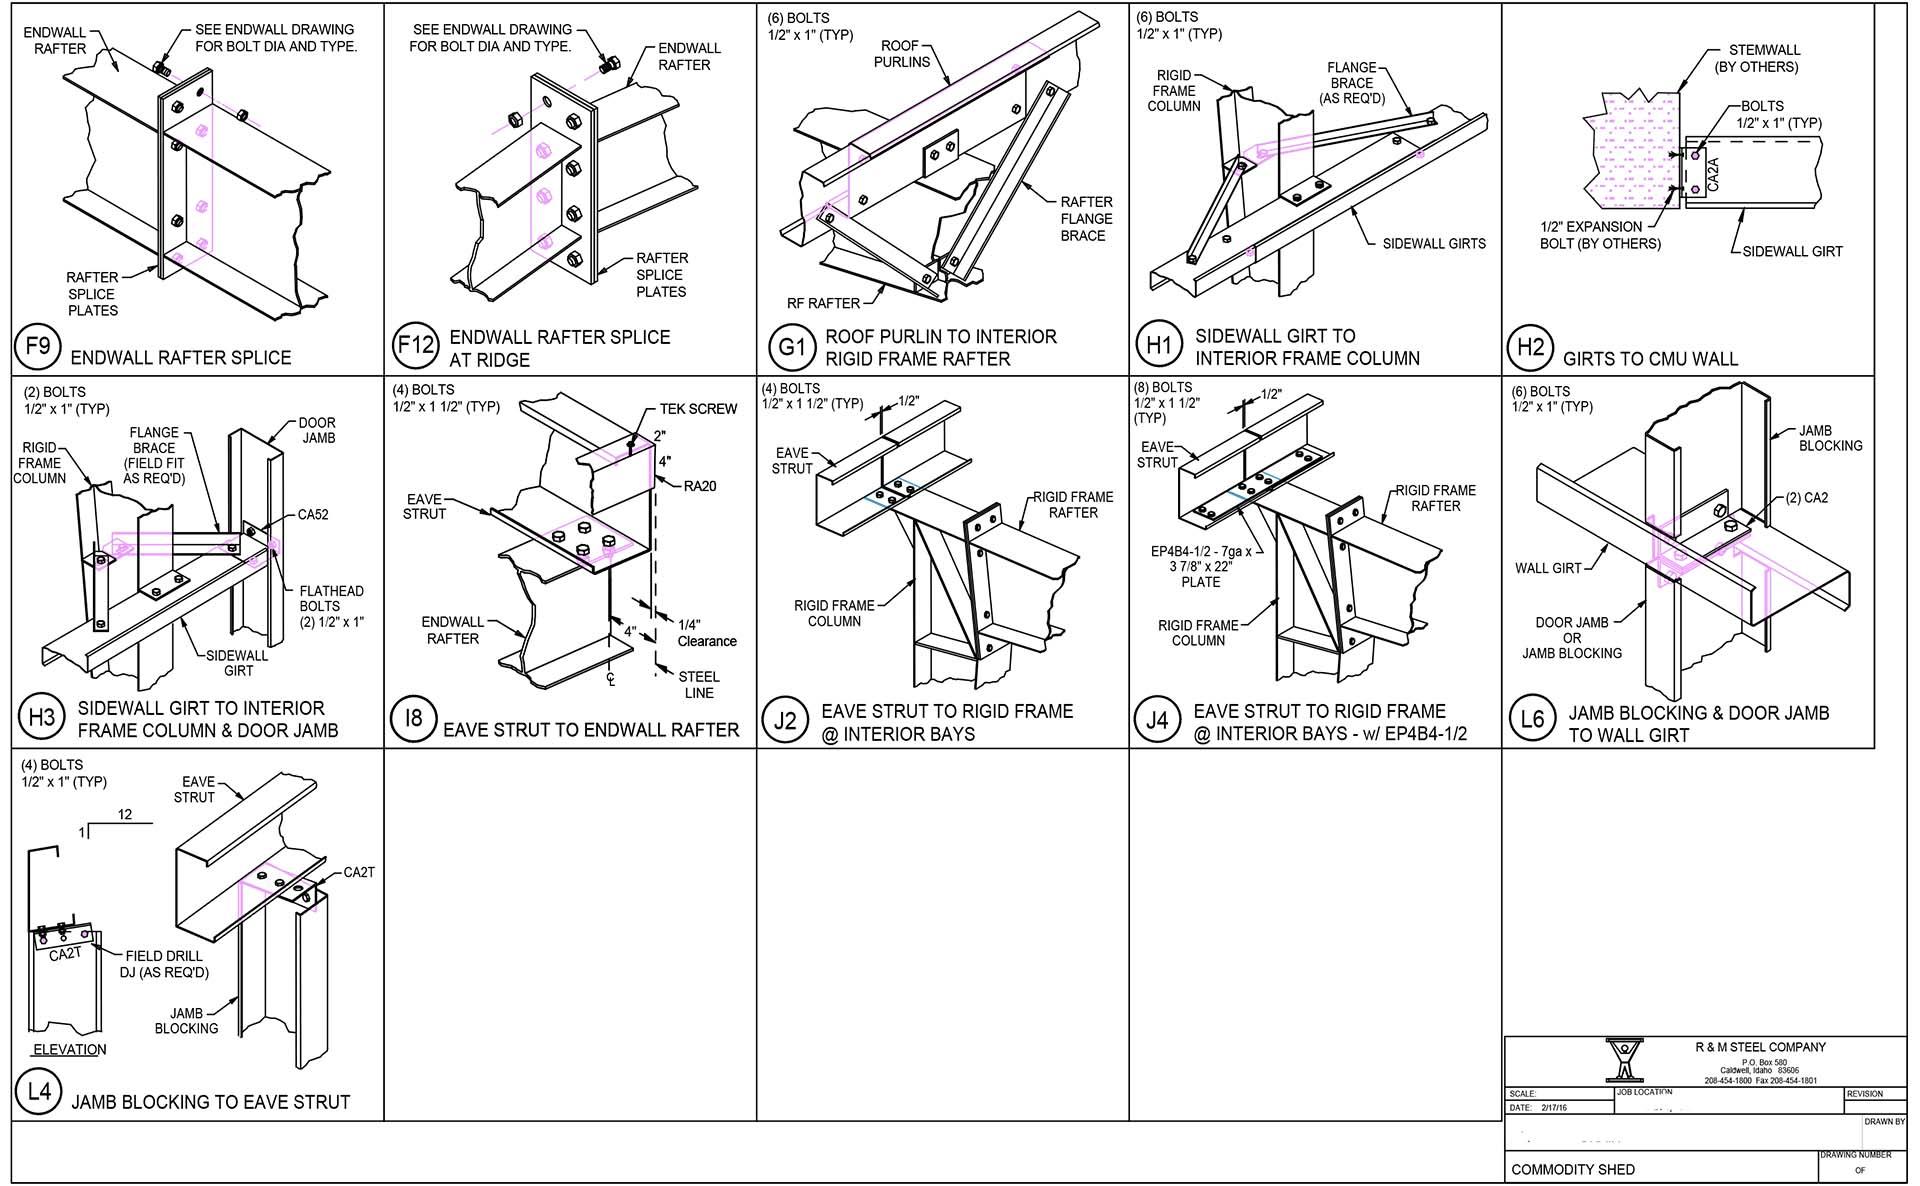 \\steel2017a\Drawings\DRAWINGS\2016\02\FA126126\12-Dtls-2.FC7